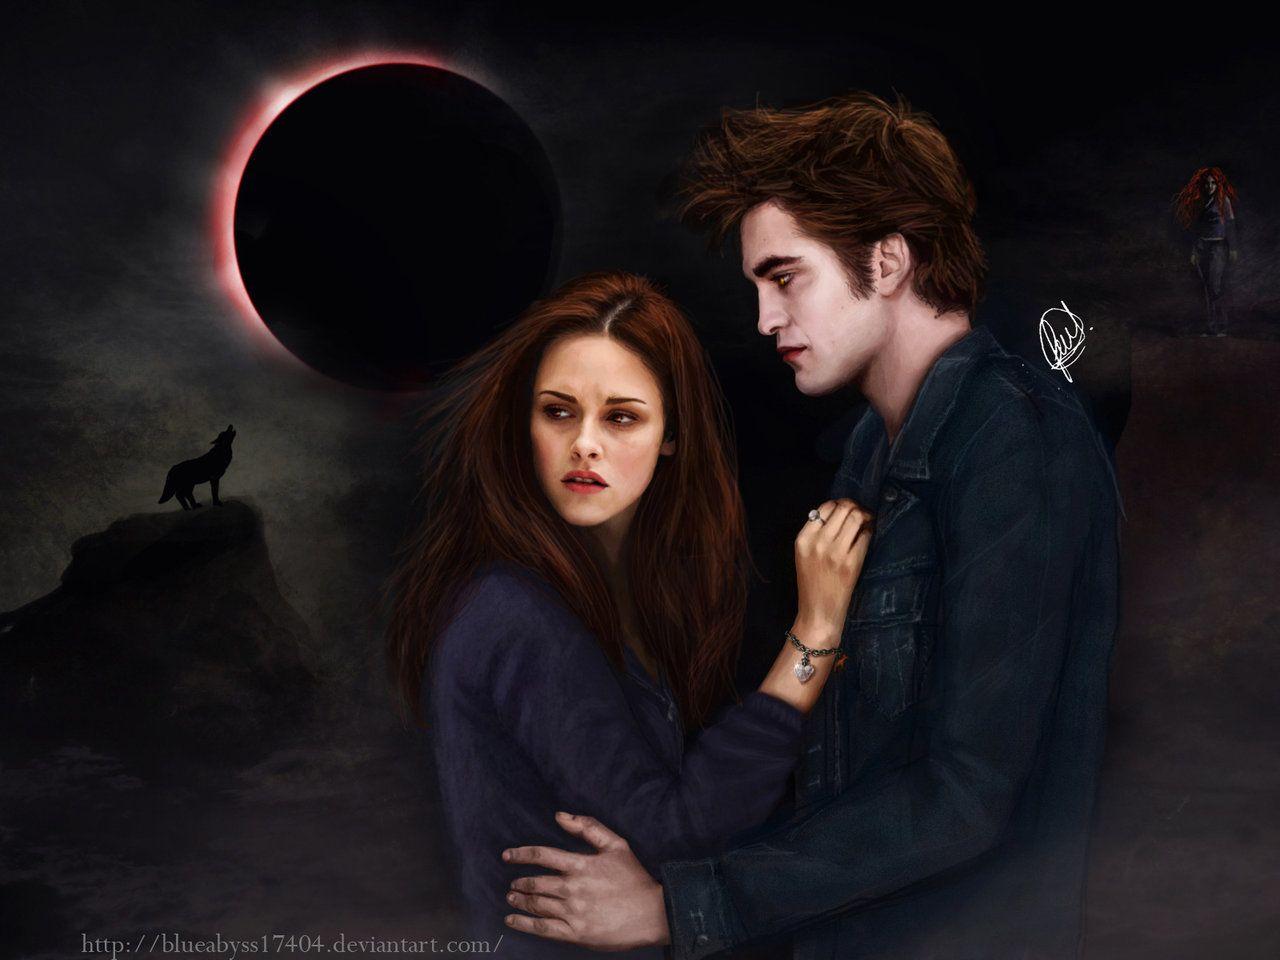 Twilight Series Wallpaper Twilight Saga Twilight Saga Twilight Pictures The Twilight Saga Eclipse